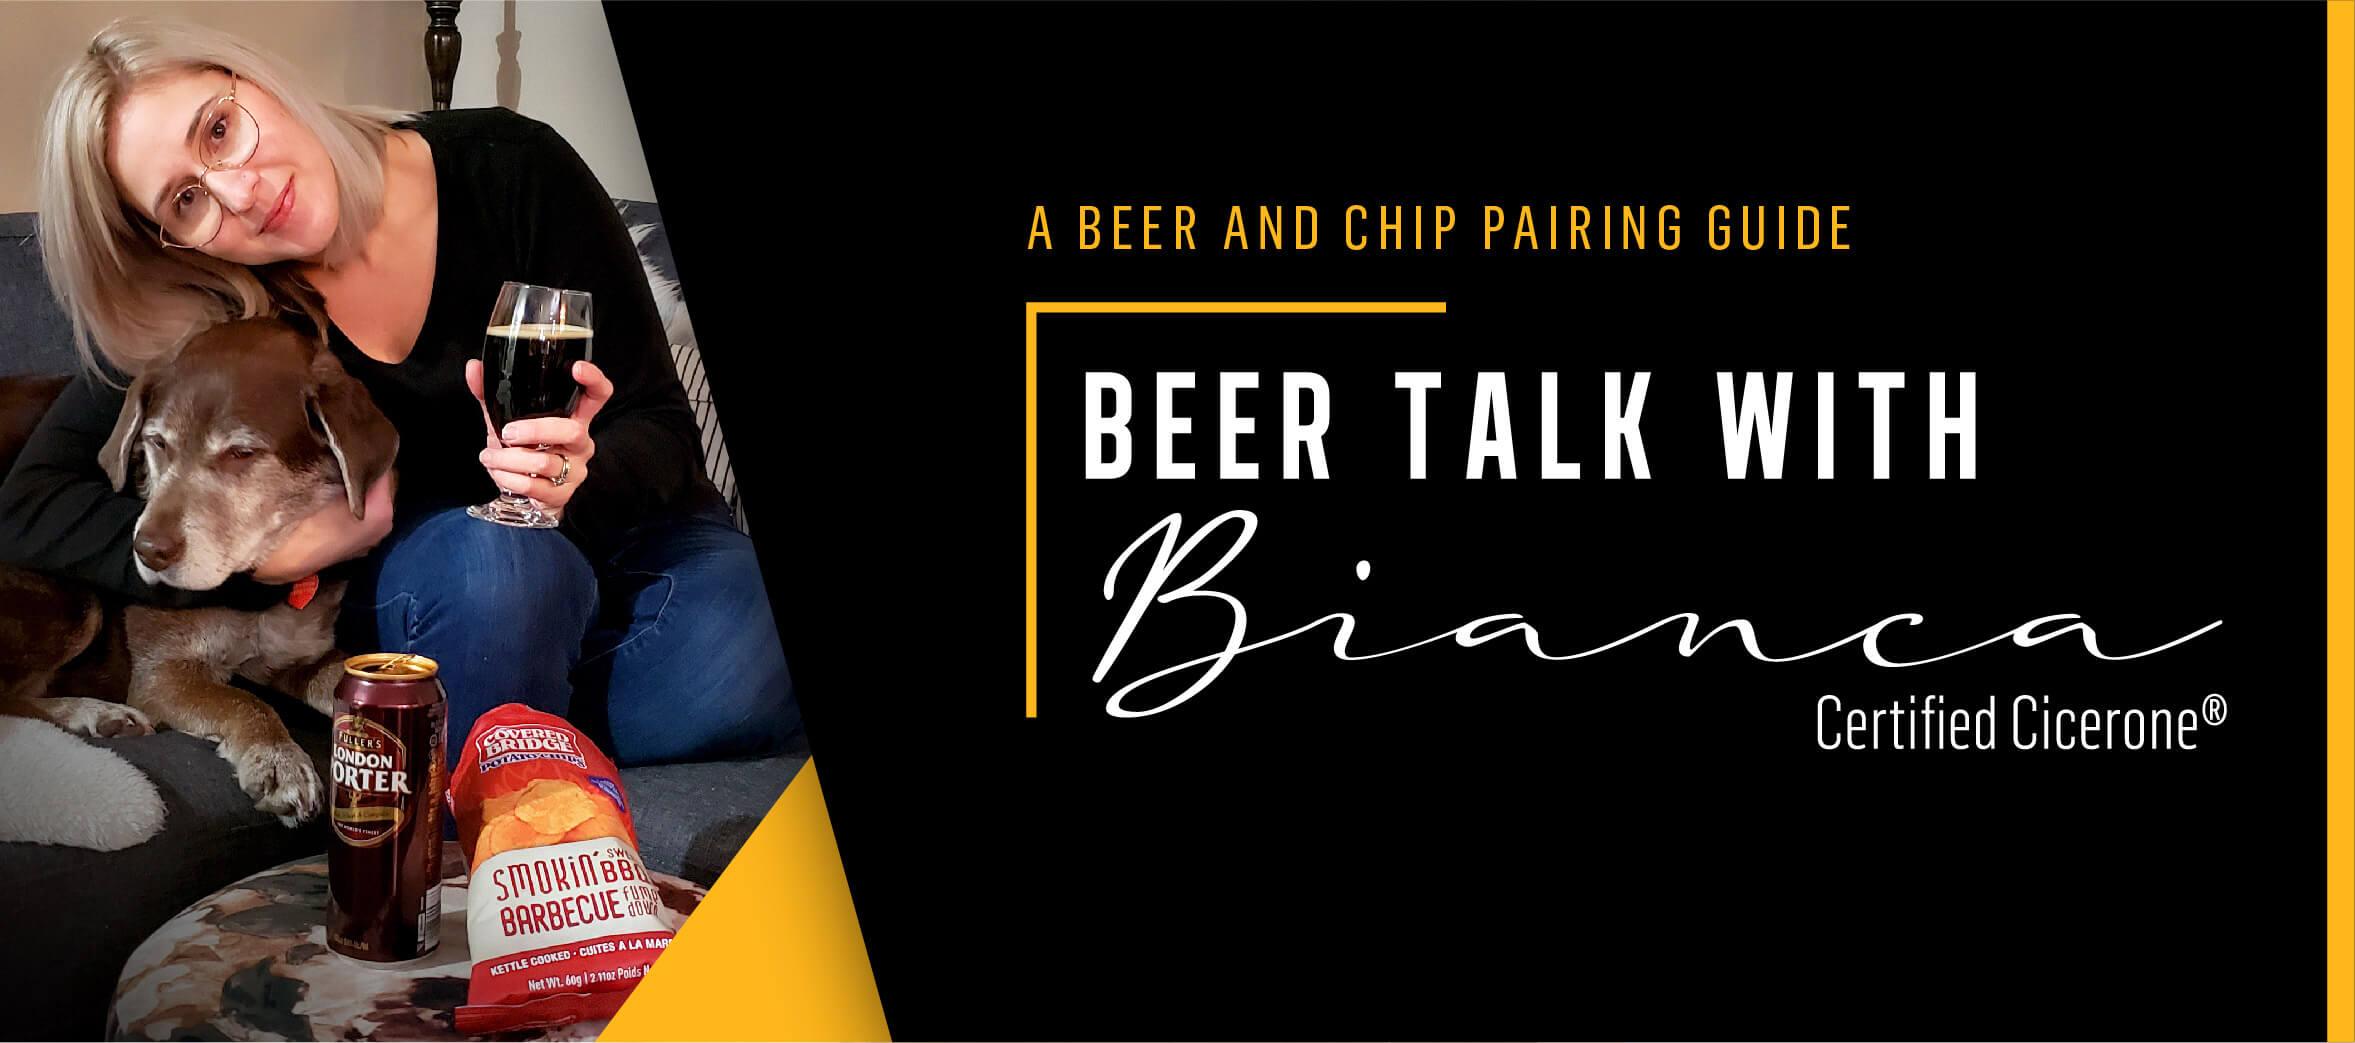 p8-20-beer-talk-header-en